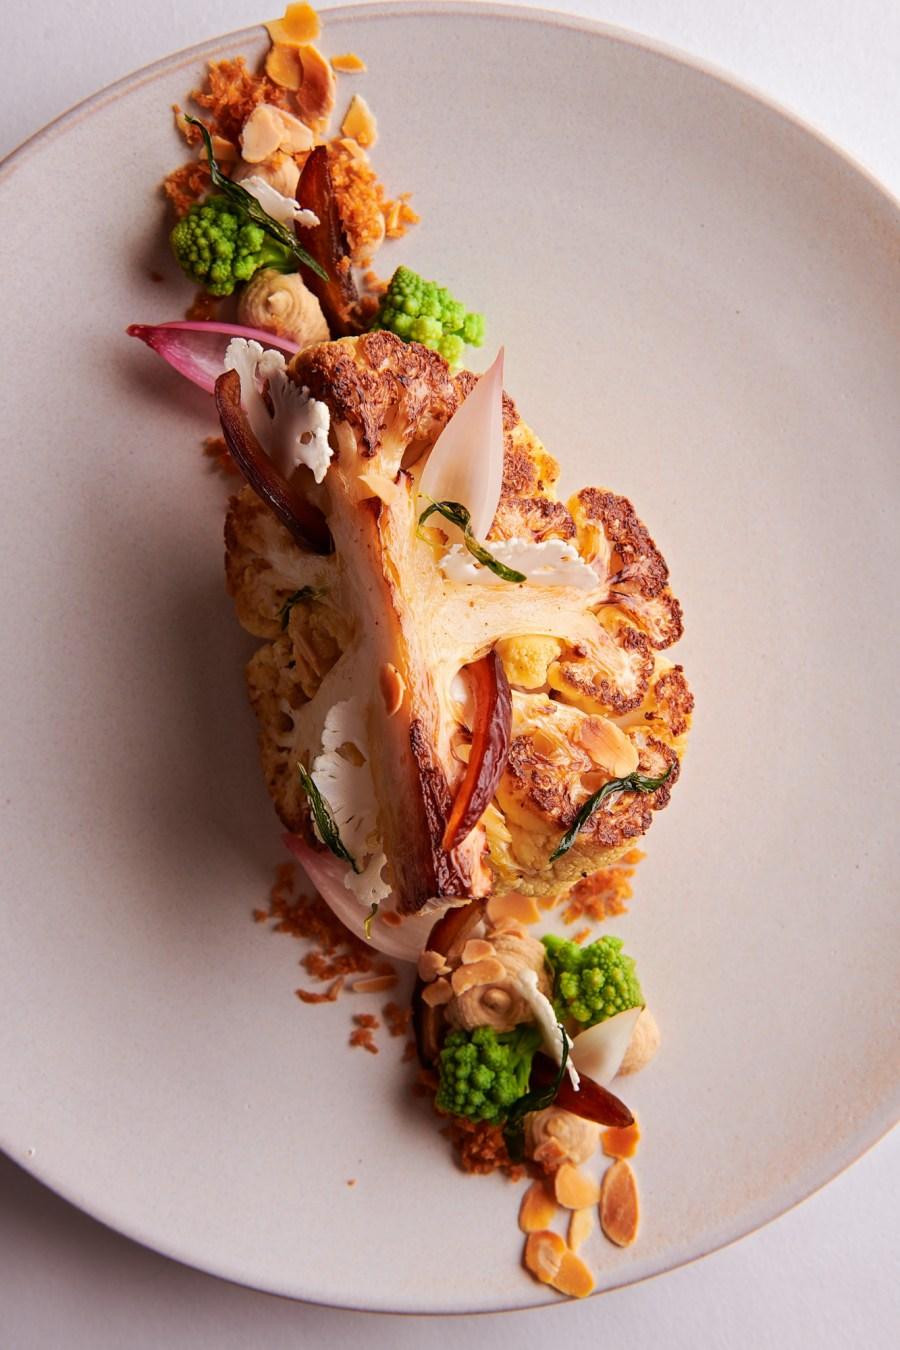 Restaurant Review: Pomona's, Notting Hill